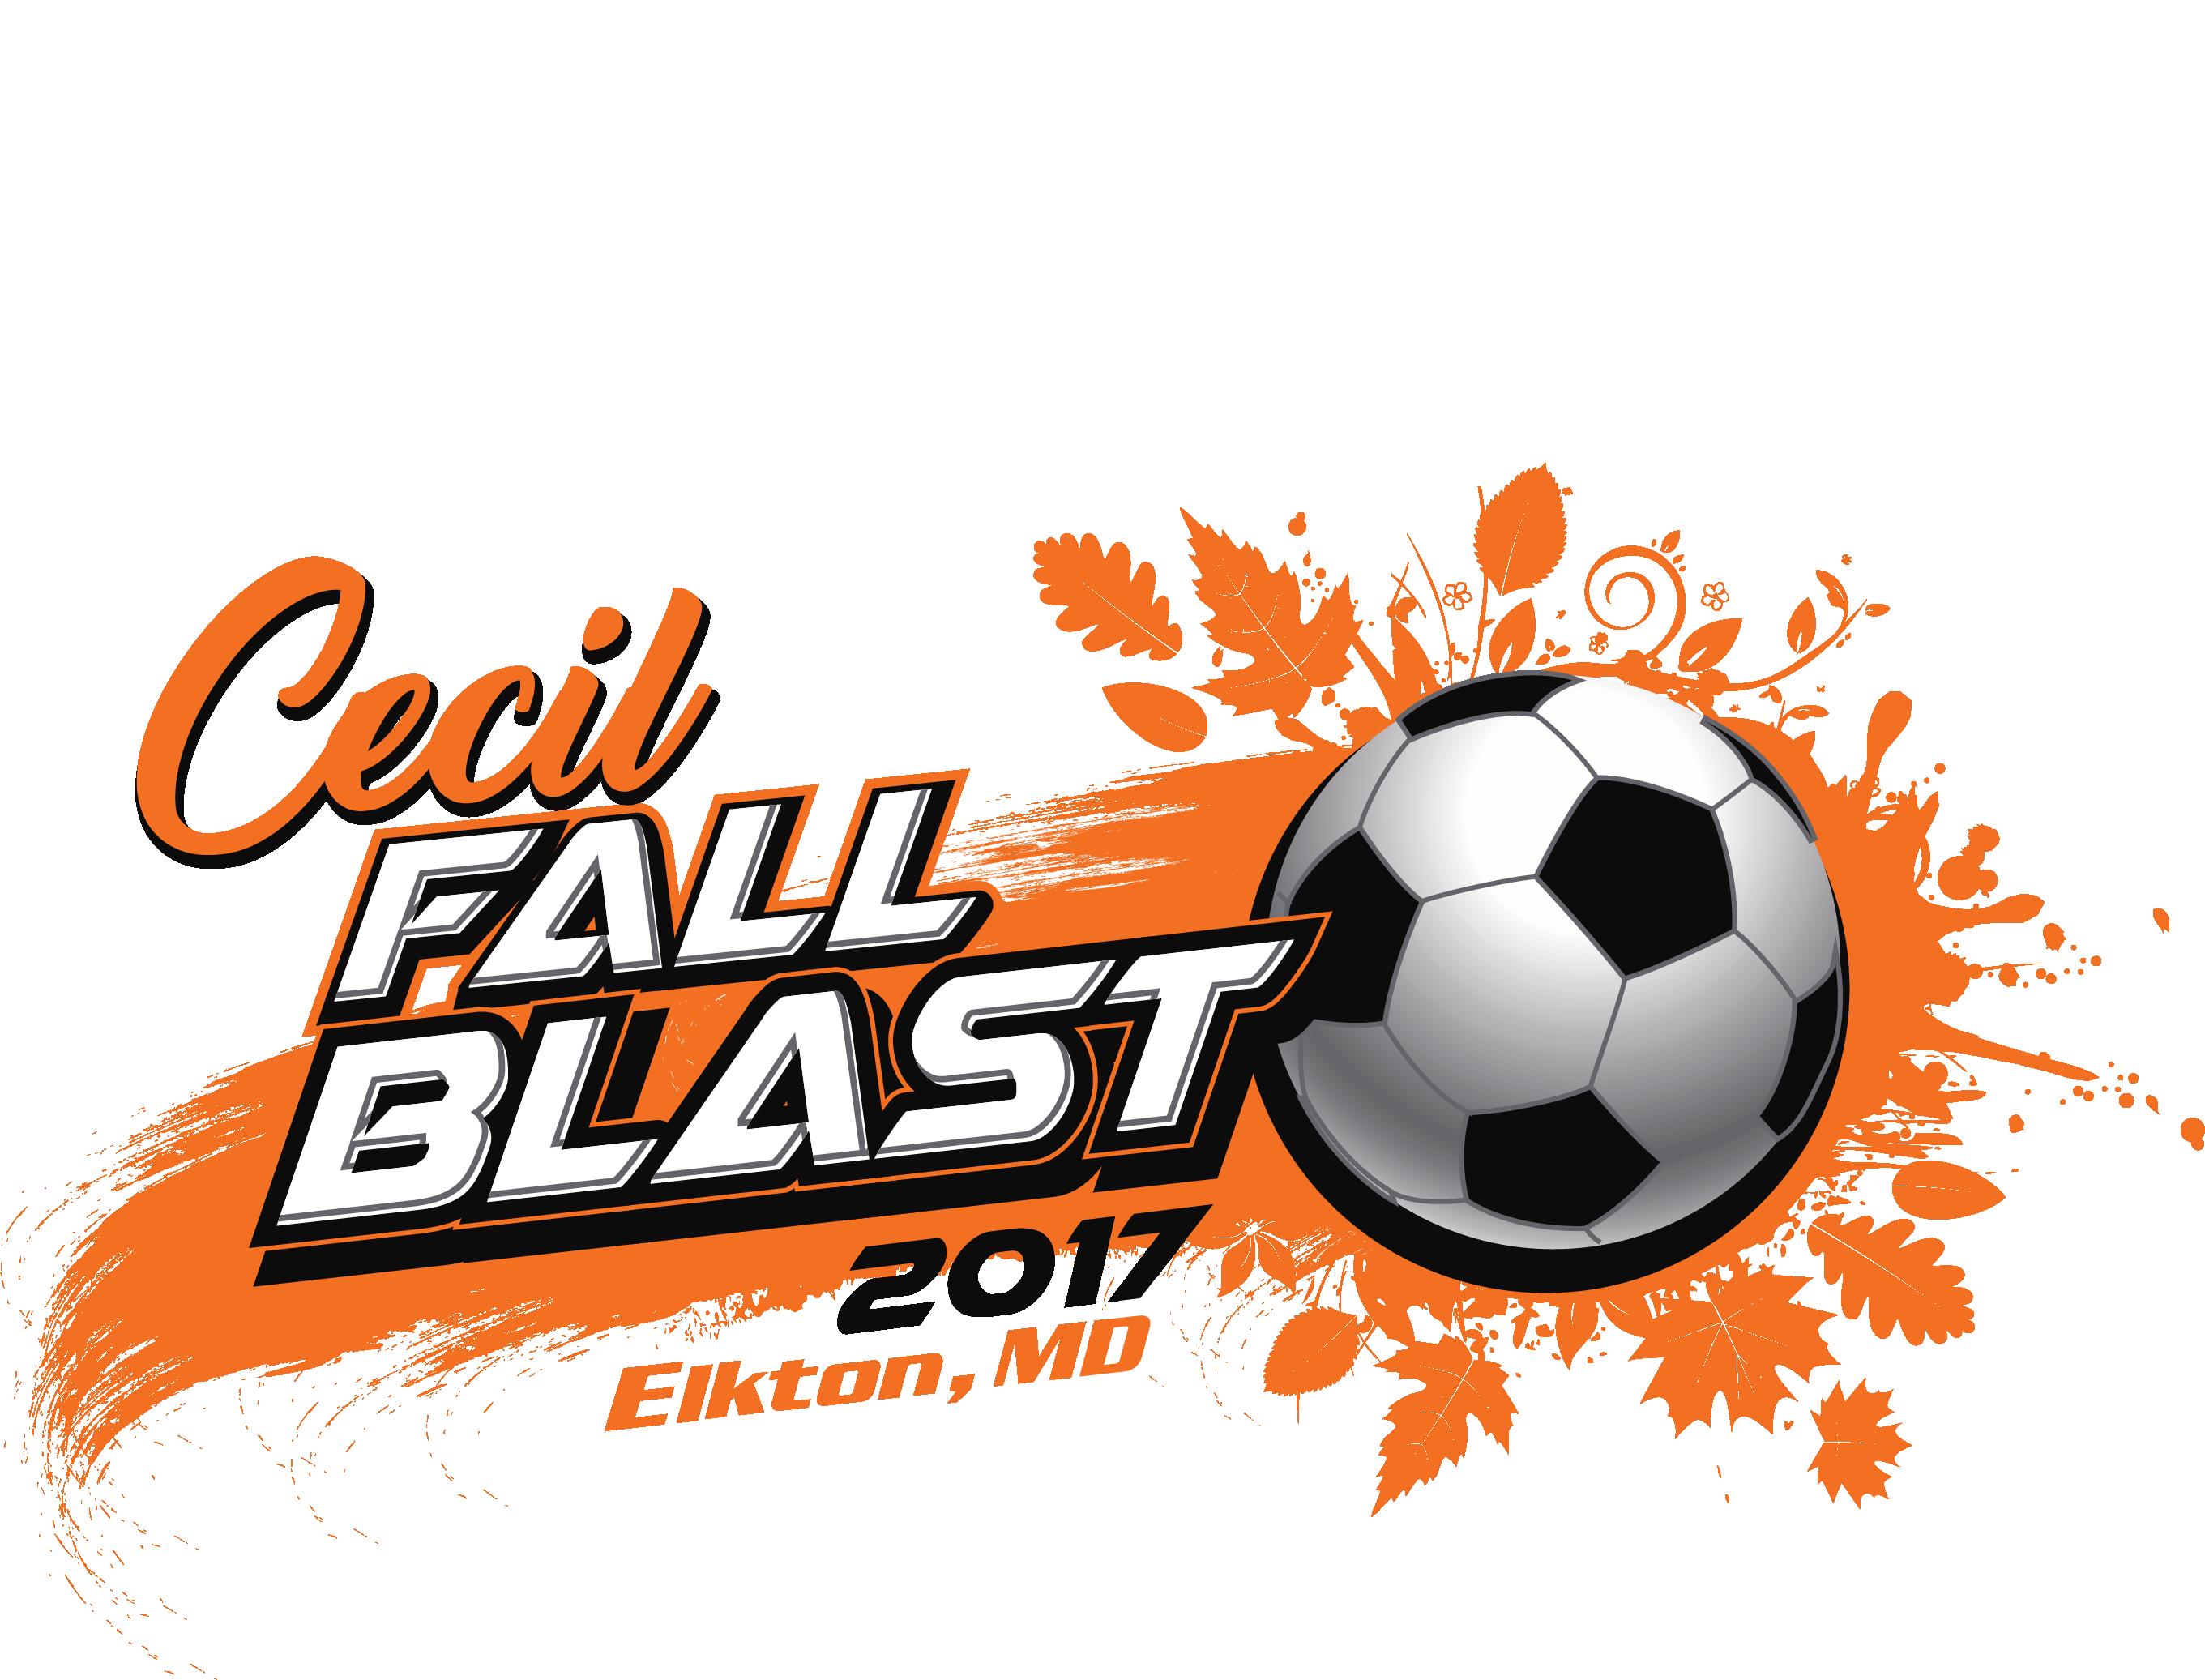 Cecil Fall Blast 2017 - November 11th